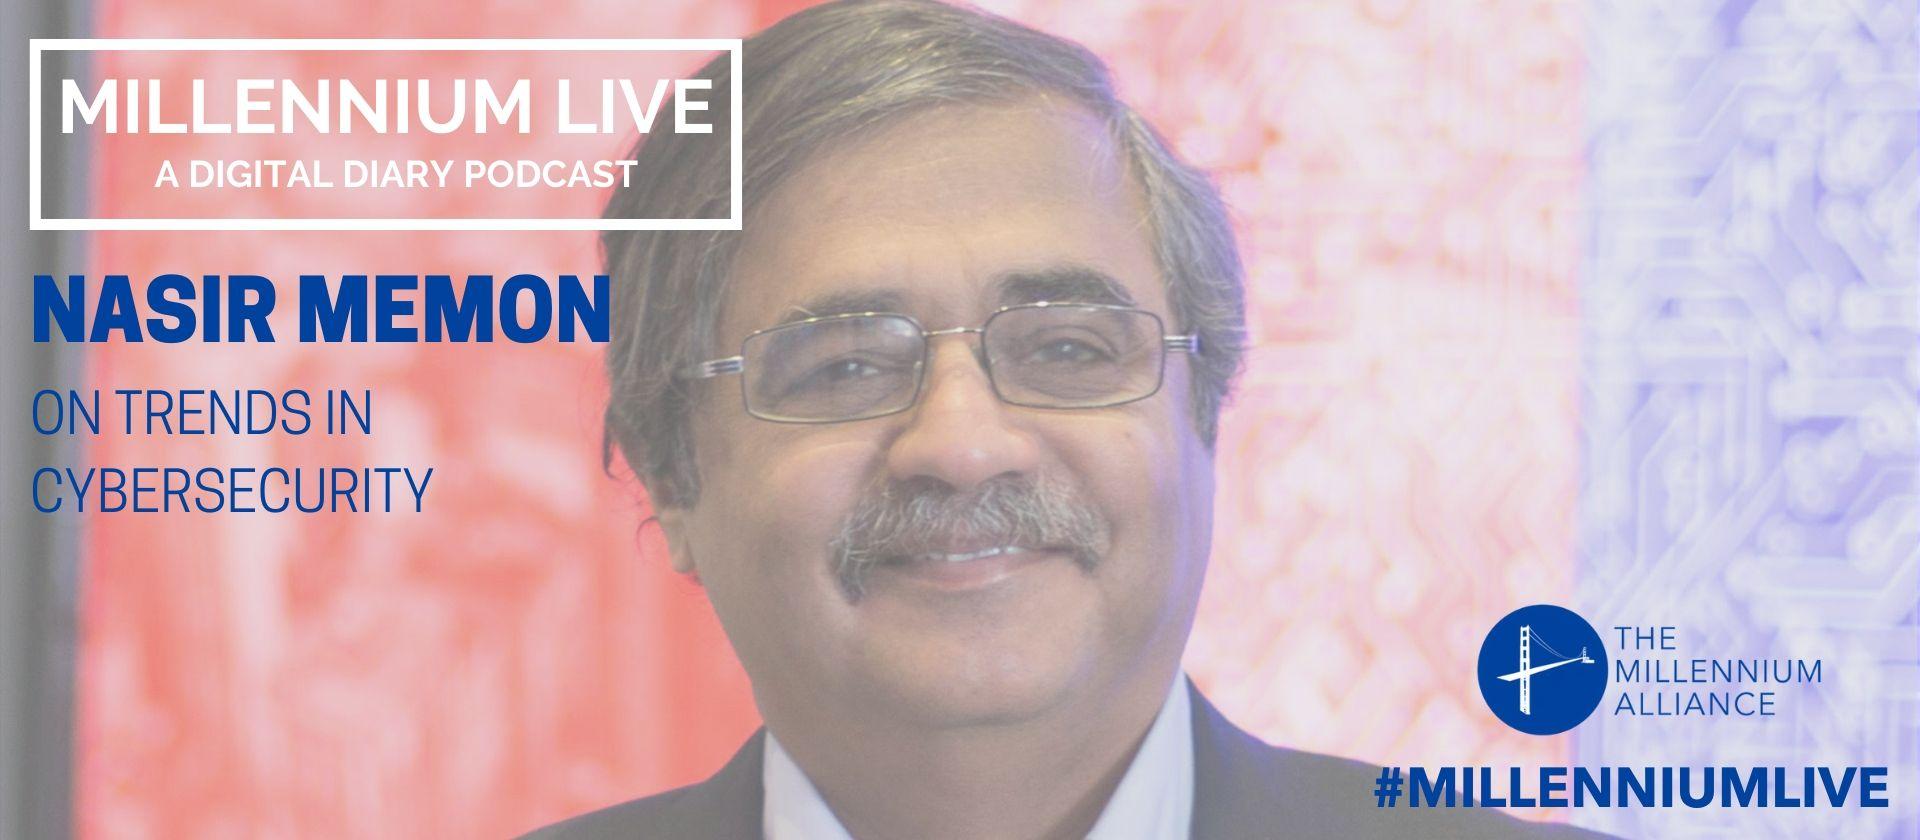 Nasir Memon Cybersecurity Podcast